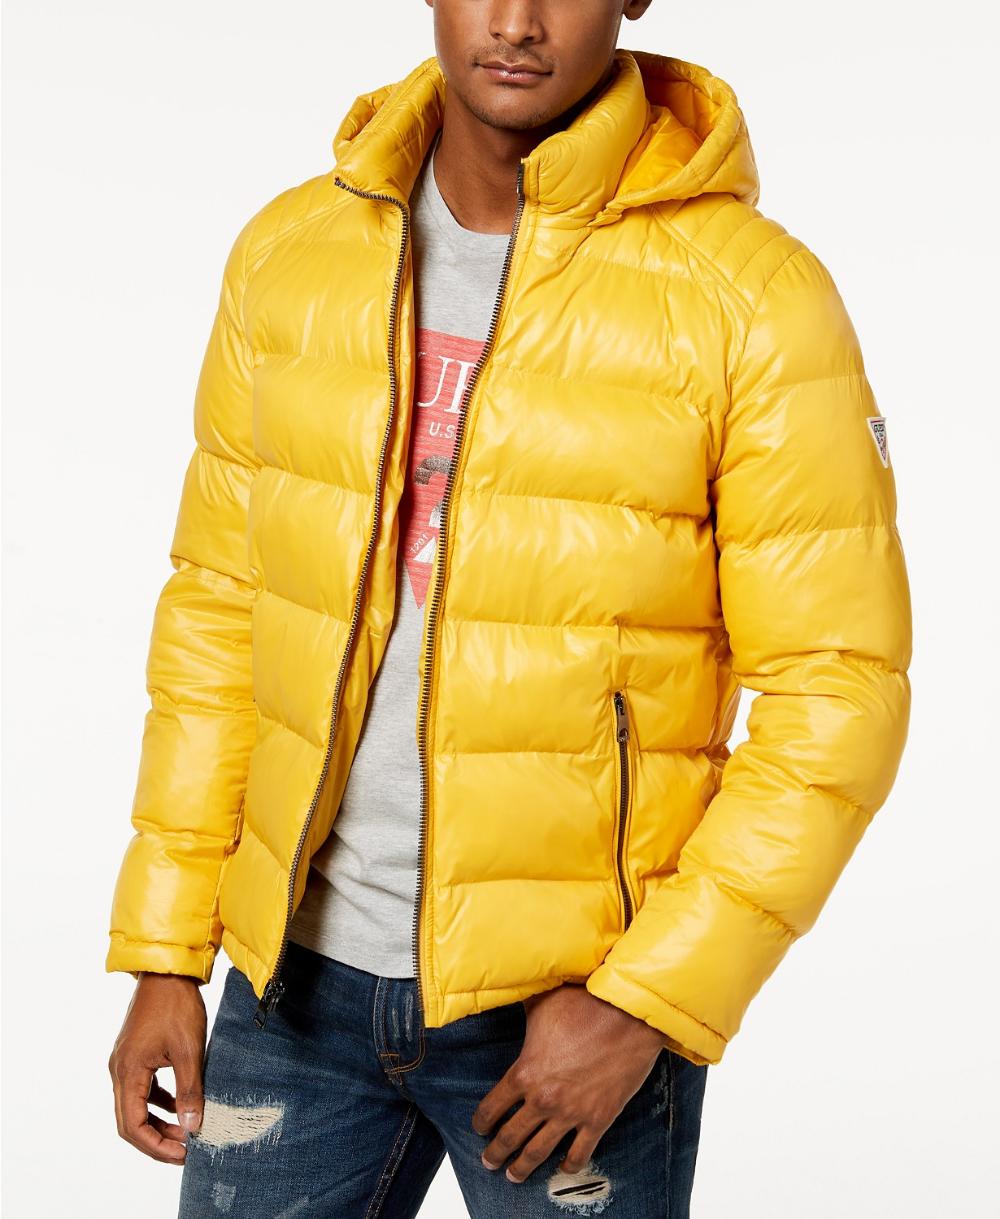 Guess Men S Hooded Puffer Coat Reviews Coats Jackets Men Macy S Guess Men Mens Hooded Puffer Coat [ 1219 x 1000 Pixel ]